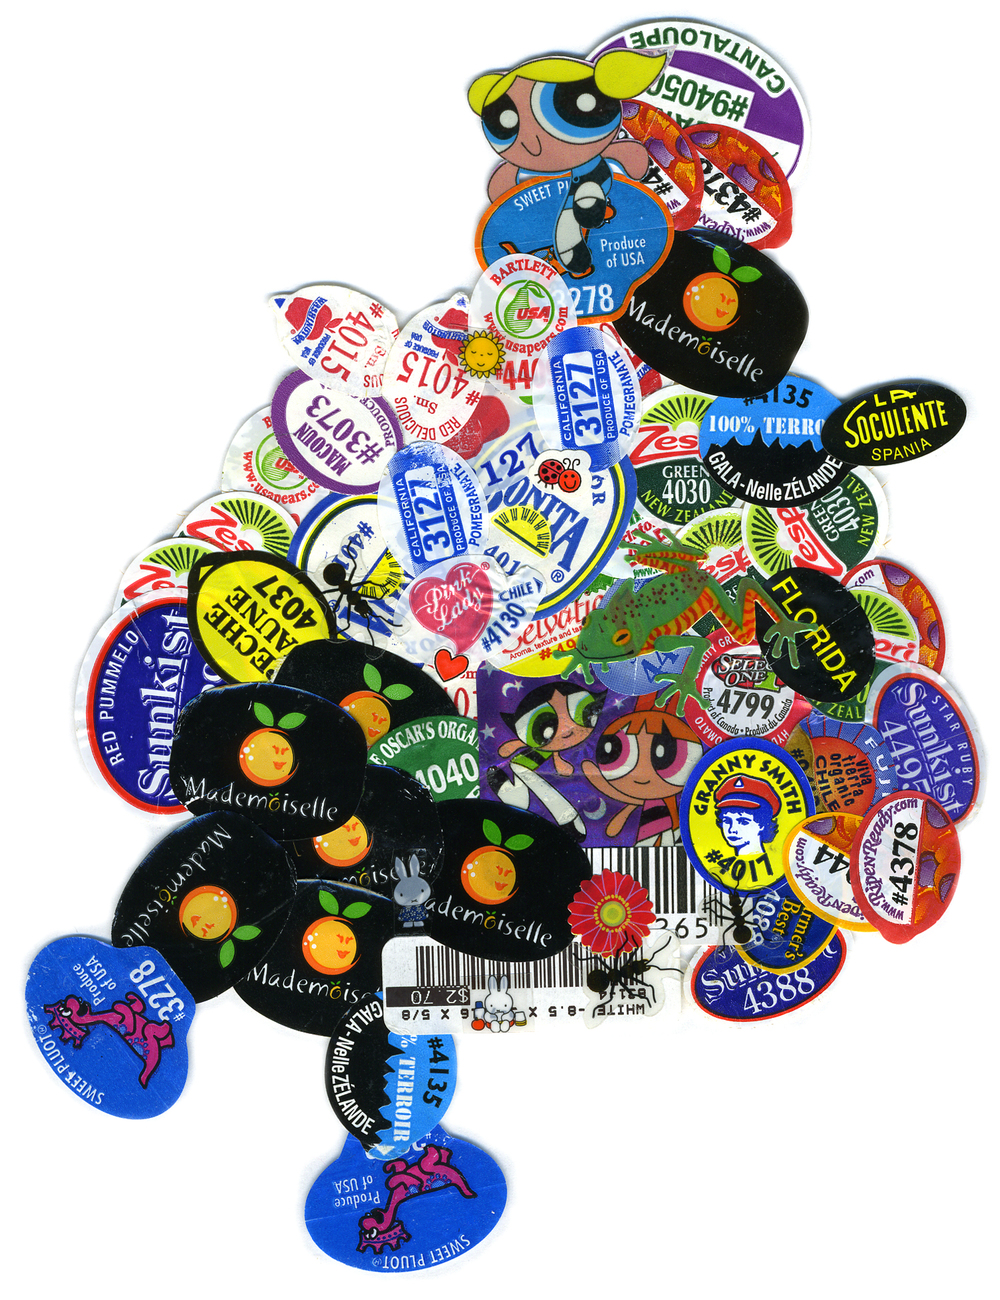 "Kitchen Art 46, ""Mademoiselle La Soculente"", 2005, stickers on Plexi, W11"" x H14""."